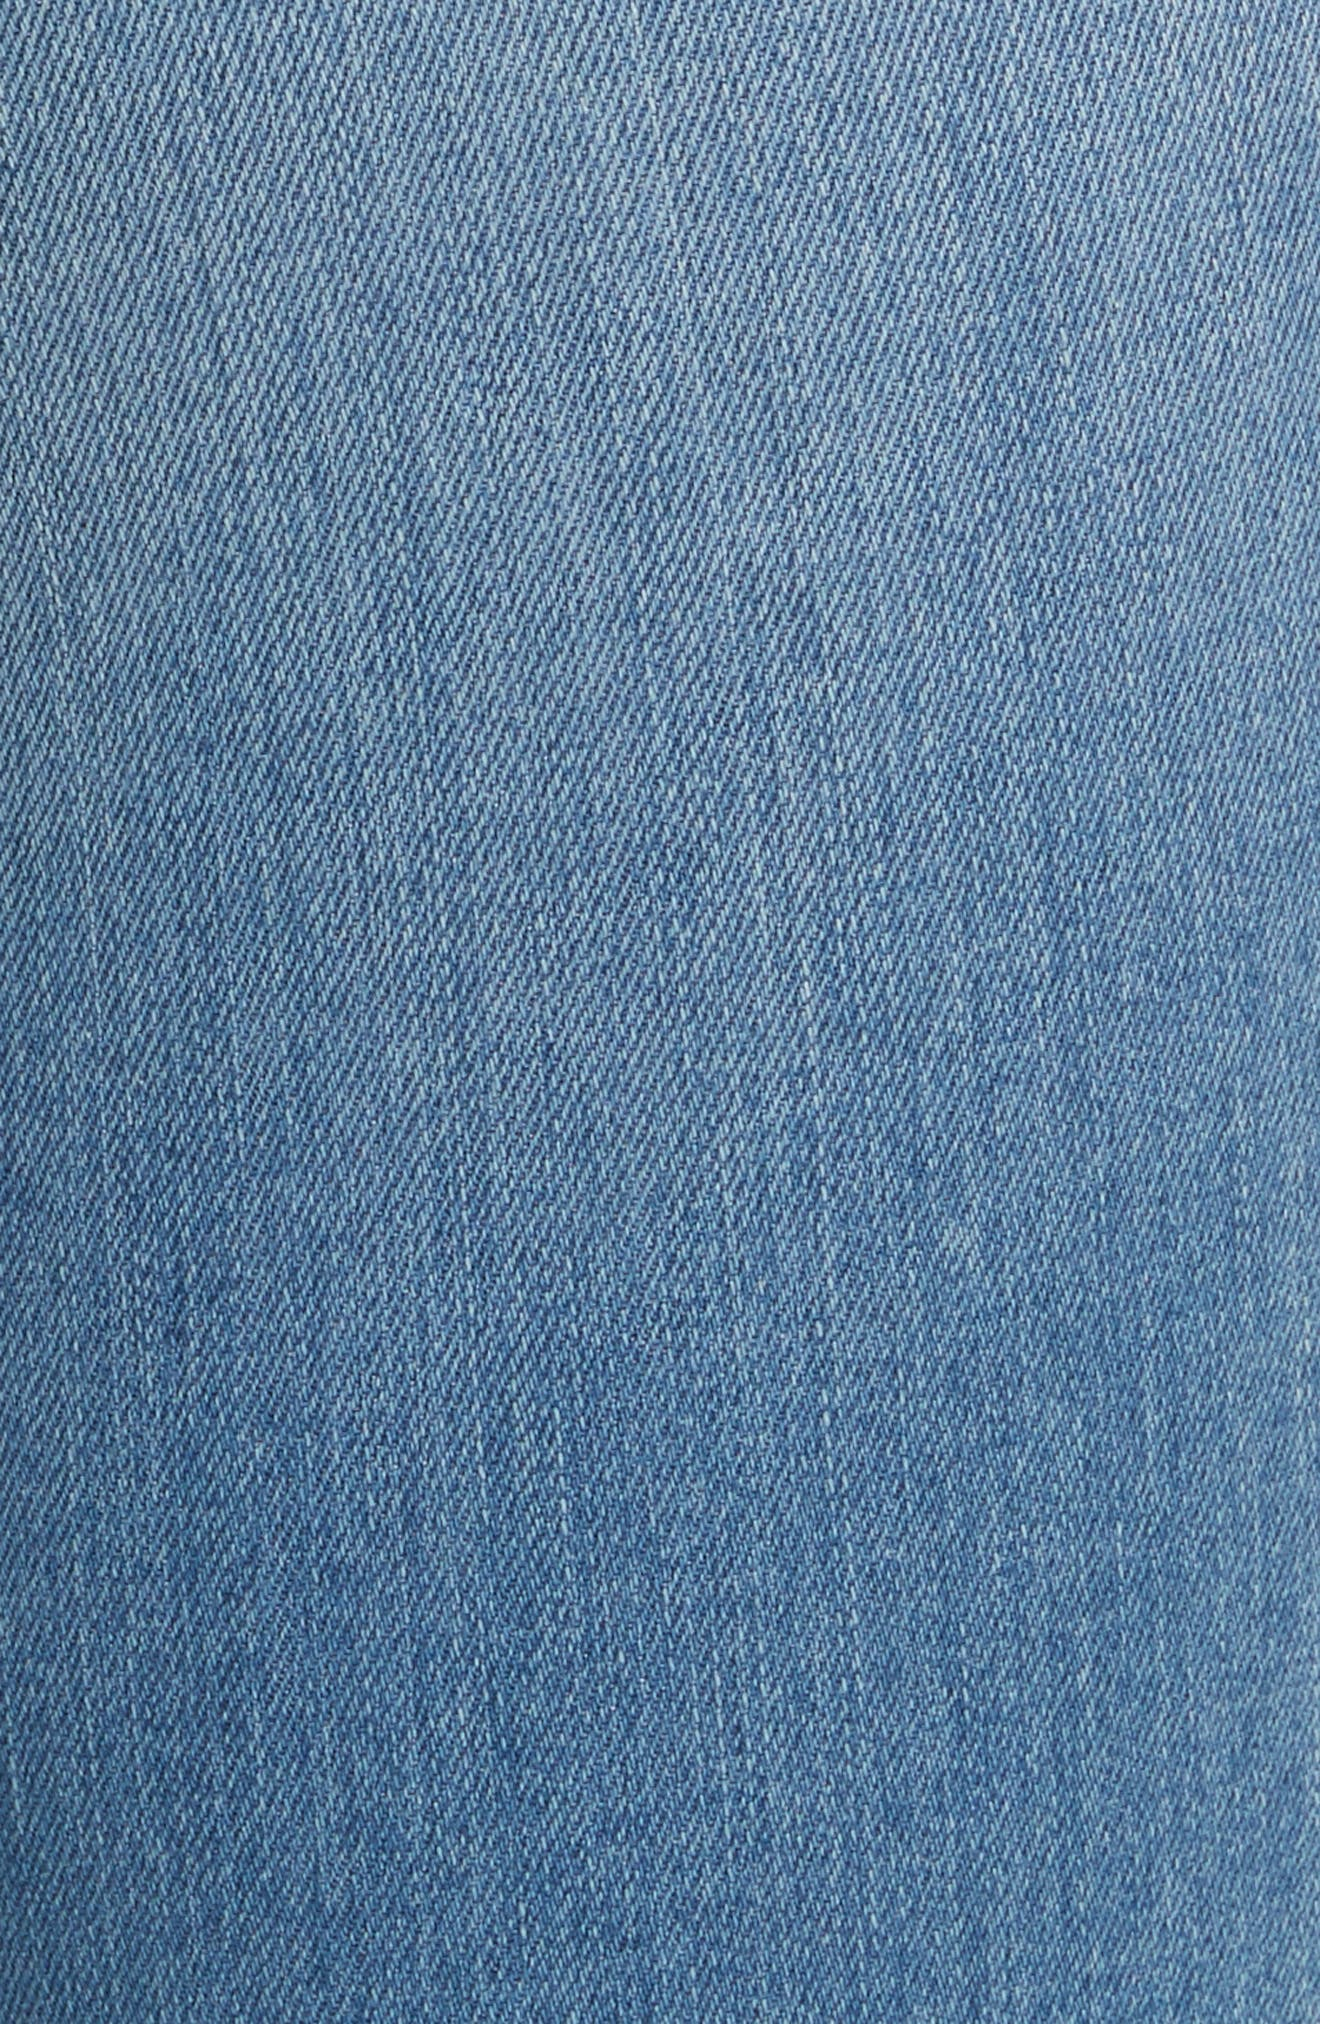 Debbie High Waist Fray Hem Jeans,                             Alternate thumbnail 5, color,                             Retro Blue